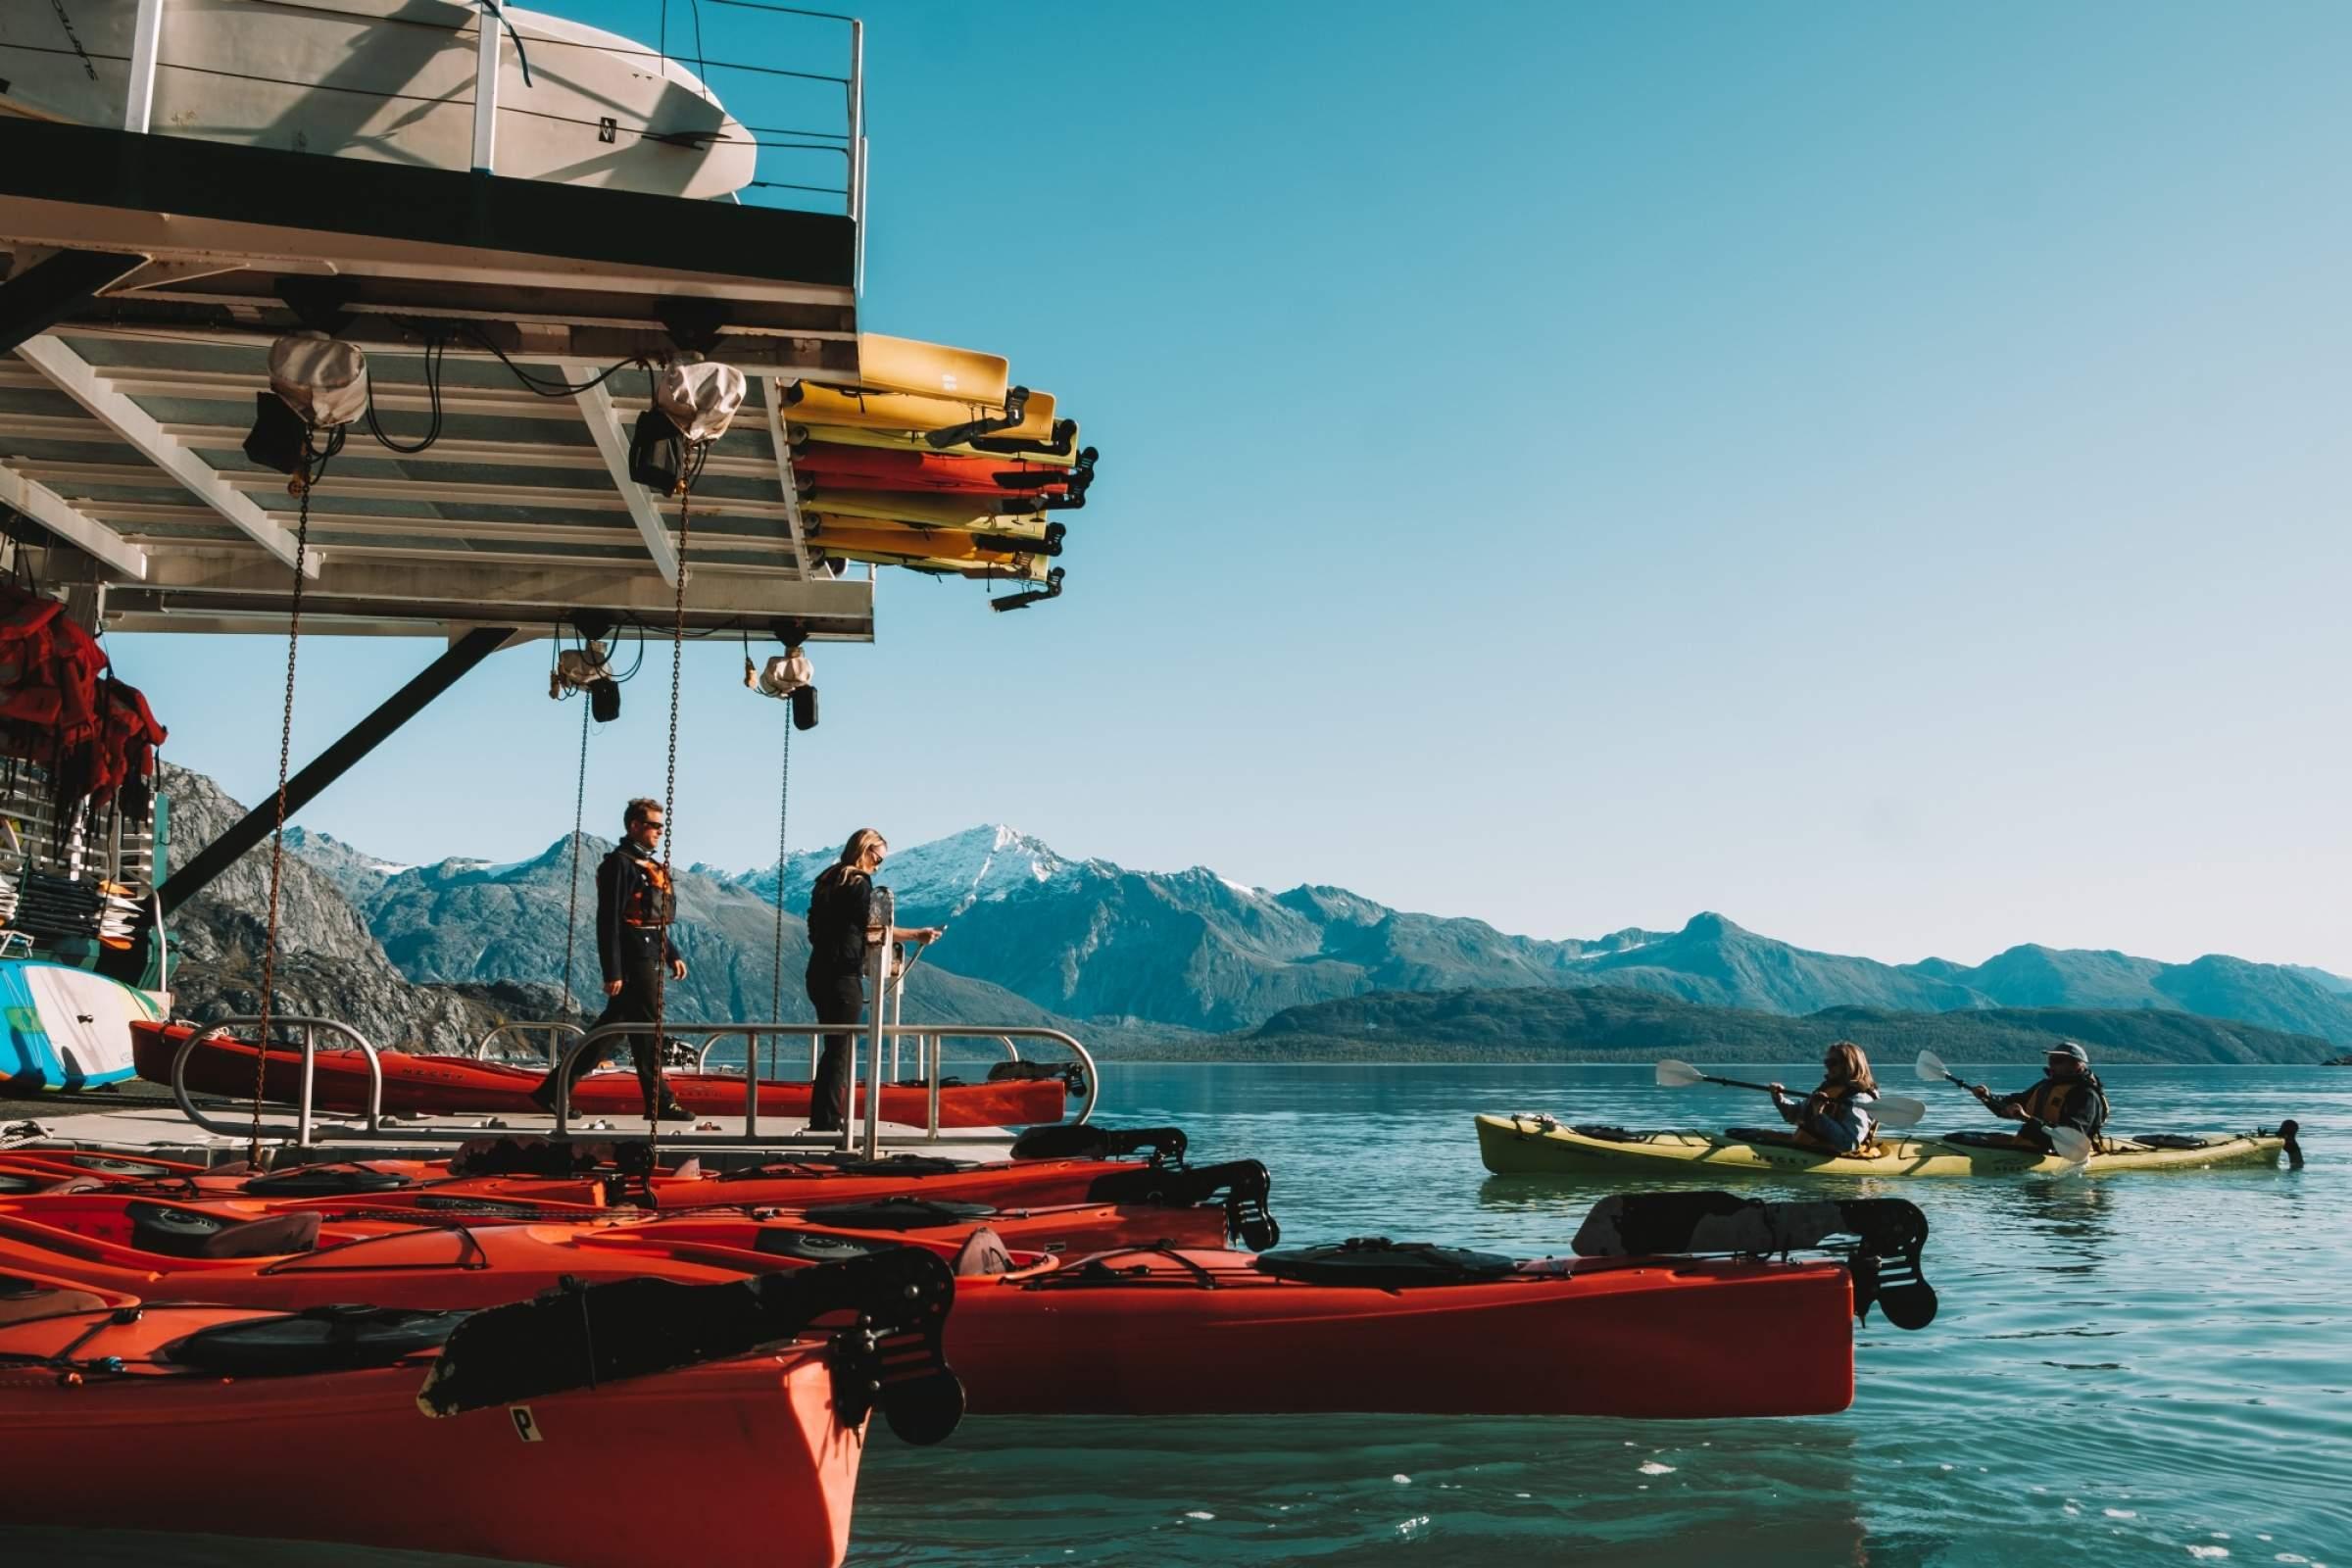 Liz Galloway Dan Blanchard Guests returning from kayaking Glacier Bay